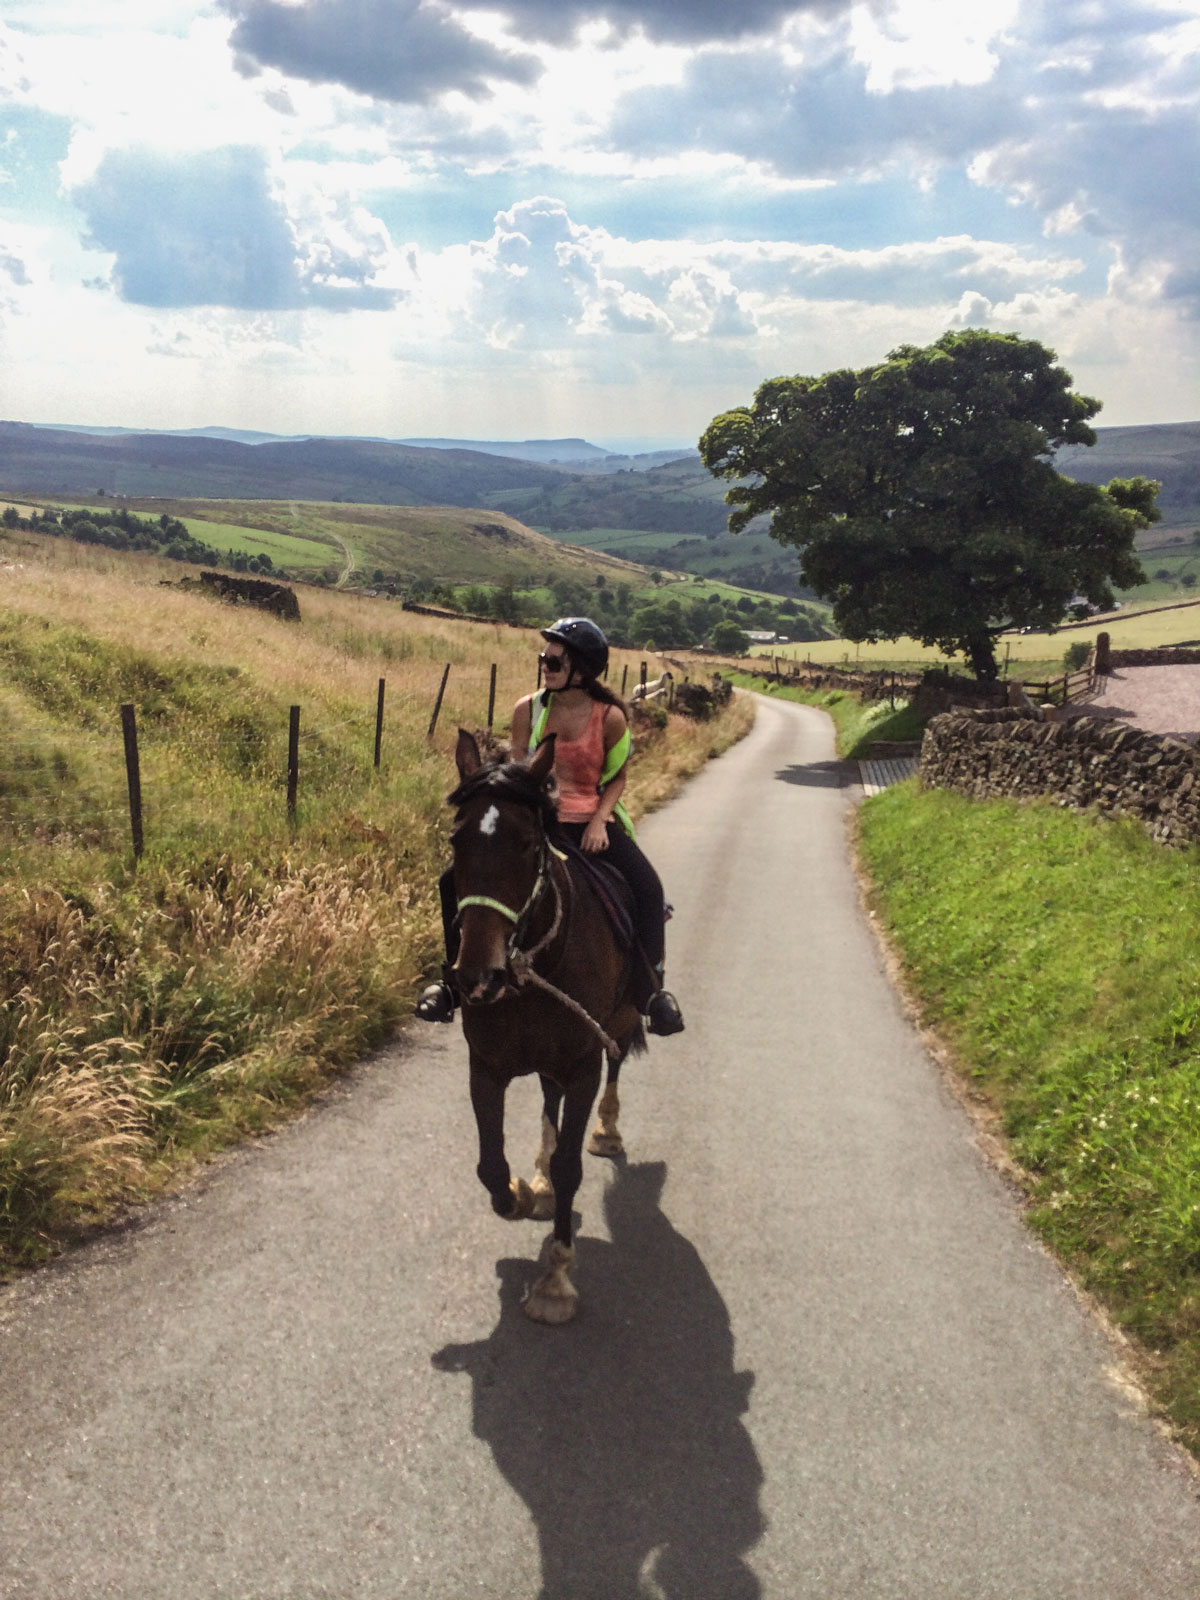 Northfield-Farm-pony-trekking-near-Bakewell-Derbyshire---Flash-England's-highest-village